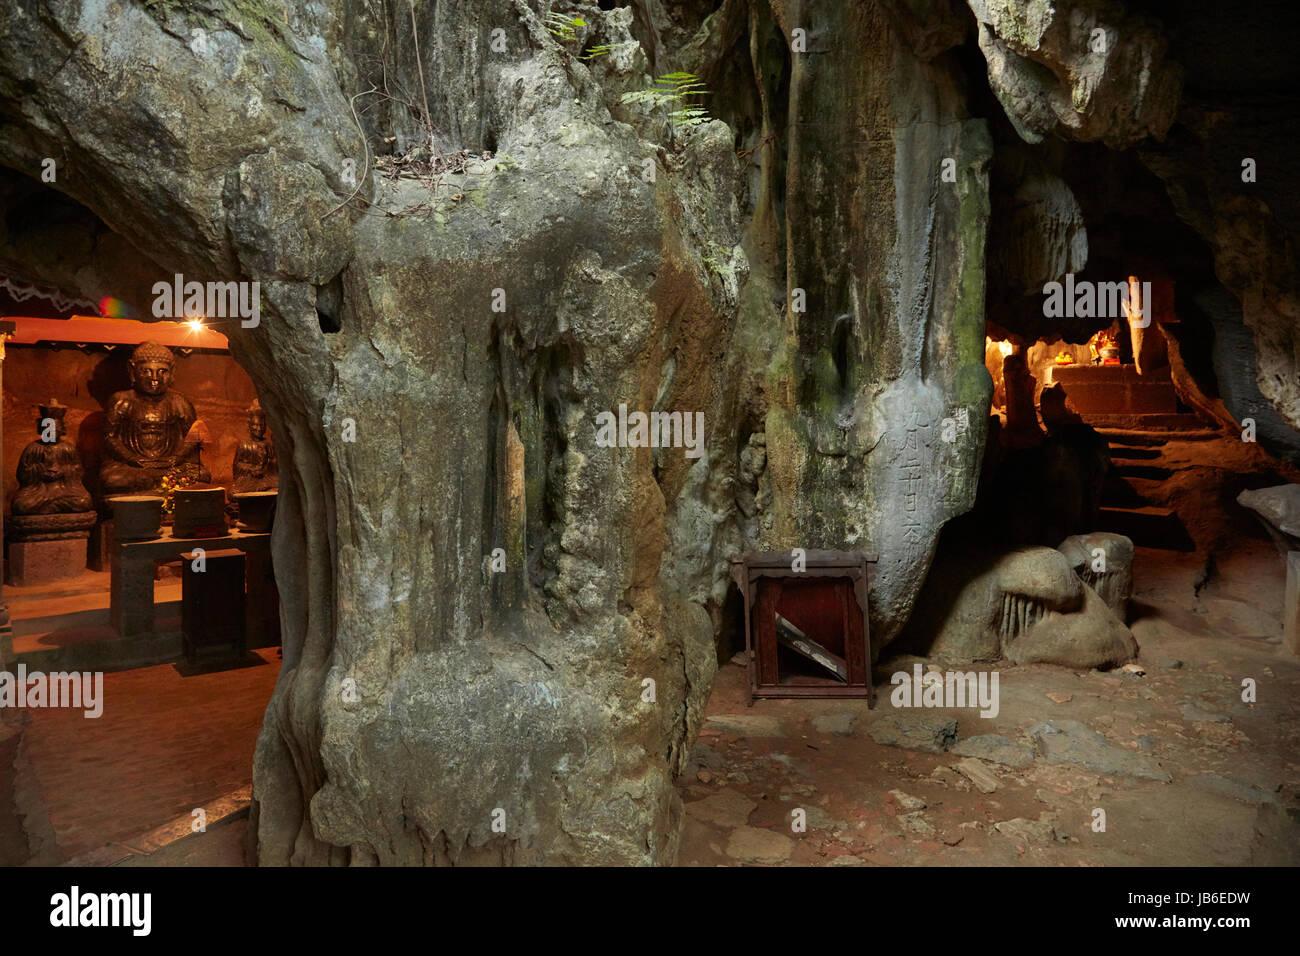 Caves at Bich Dong Pagoda complex, (UNESCO World Herritage Area), near Ninh Binh, Vietnam - Stock Image